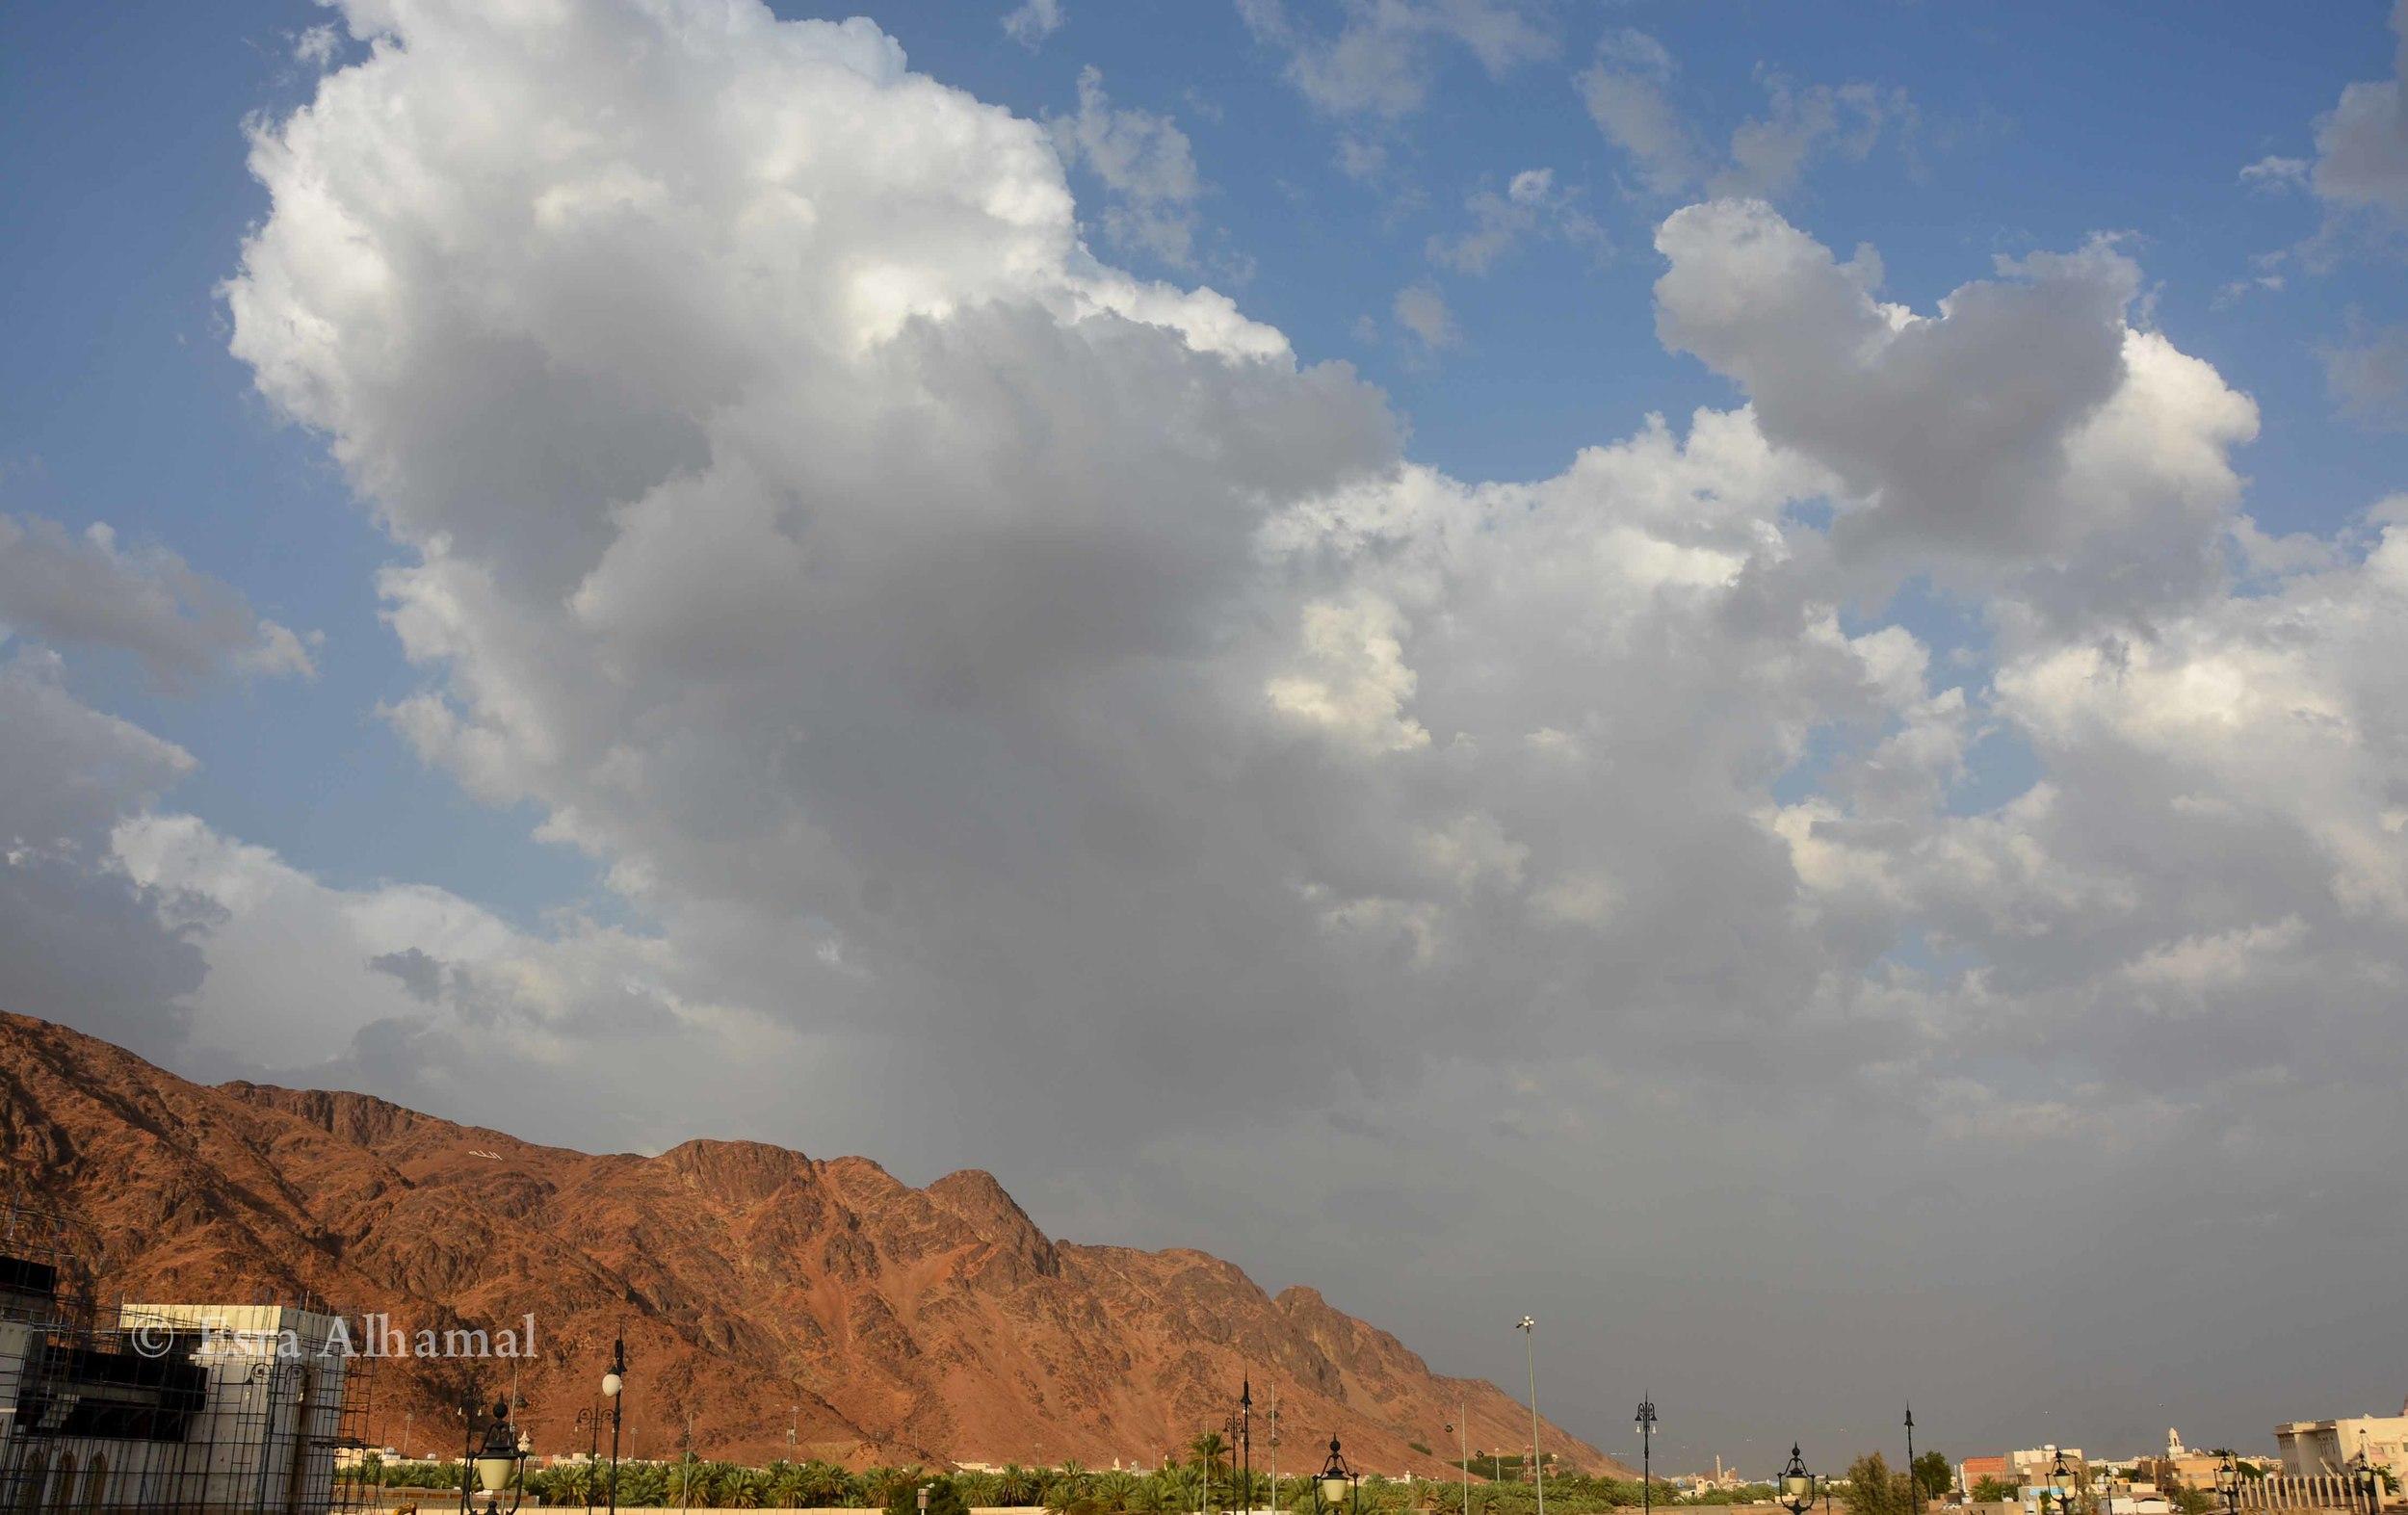 جبل أحد - Mountain Auhd